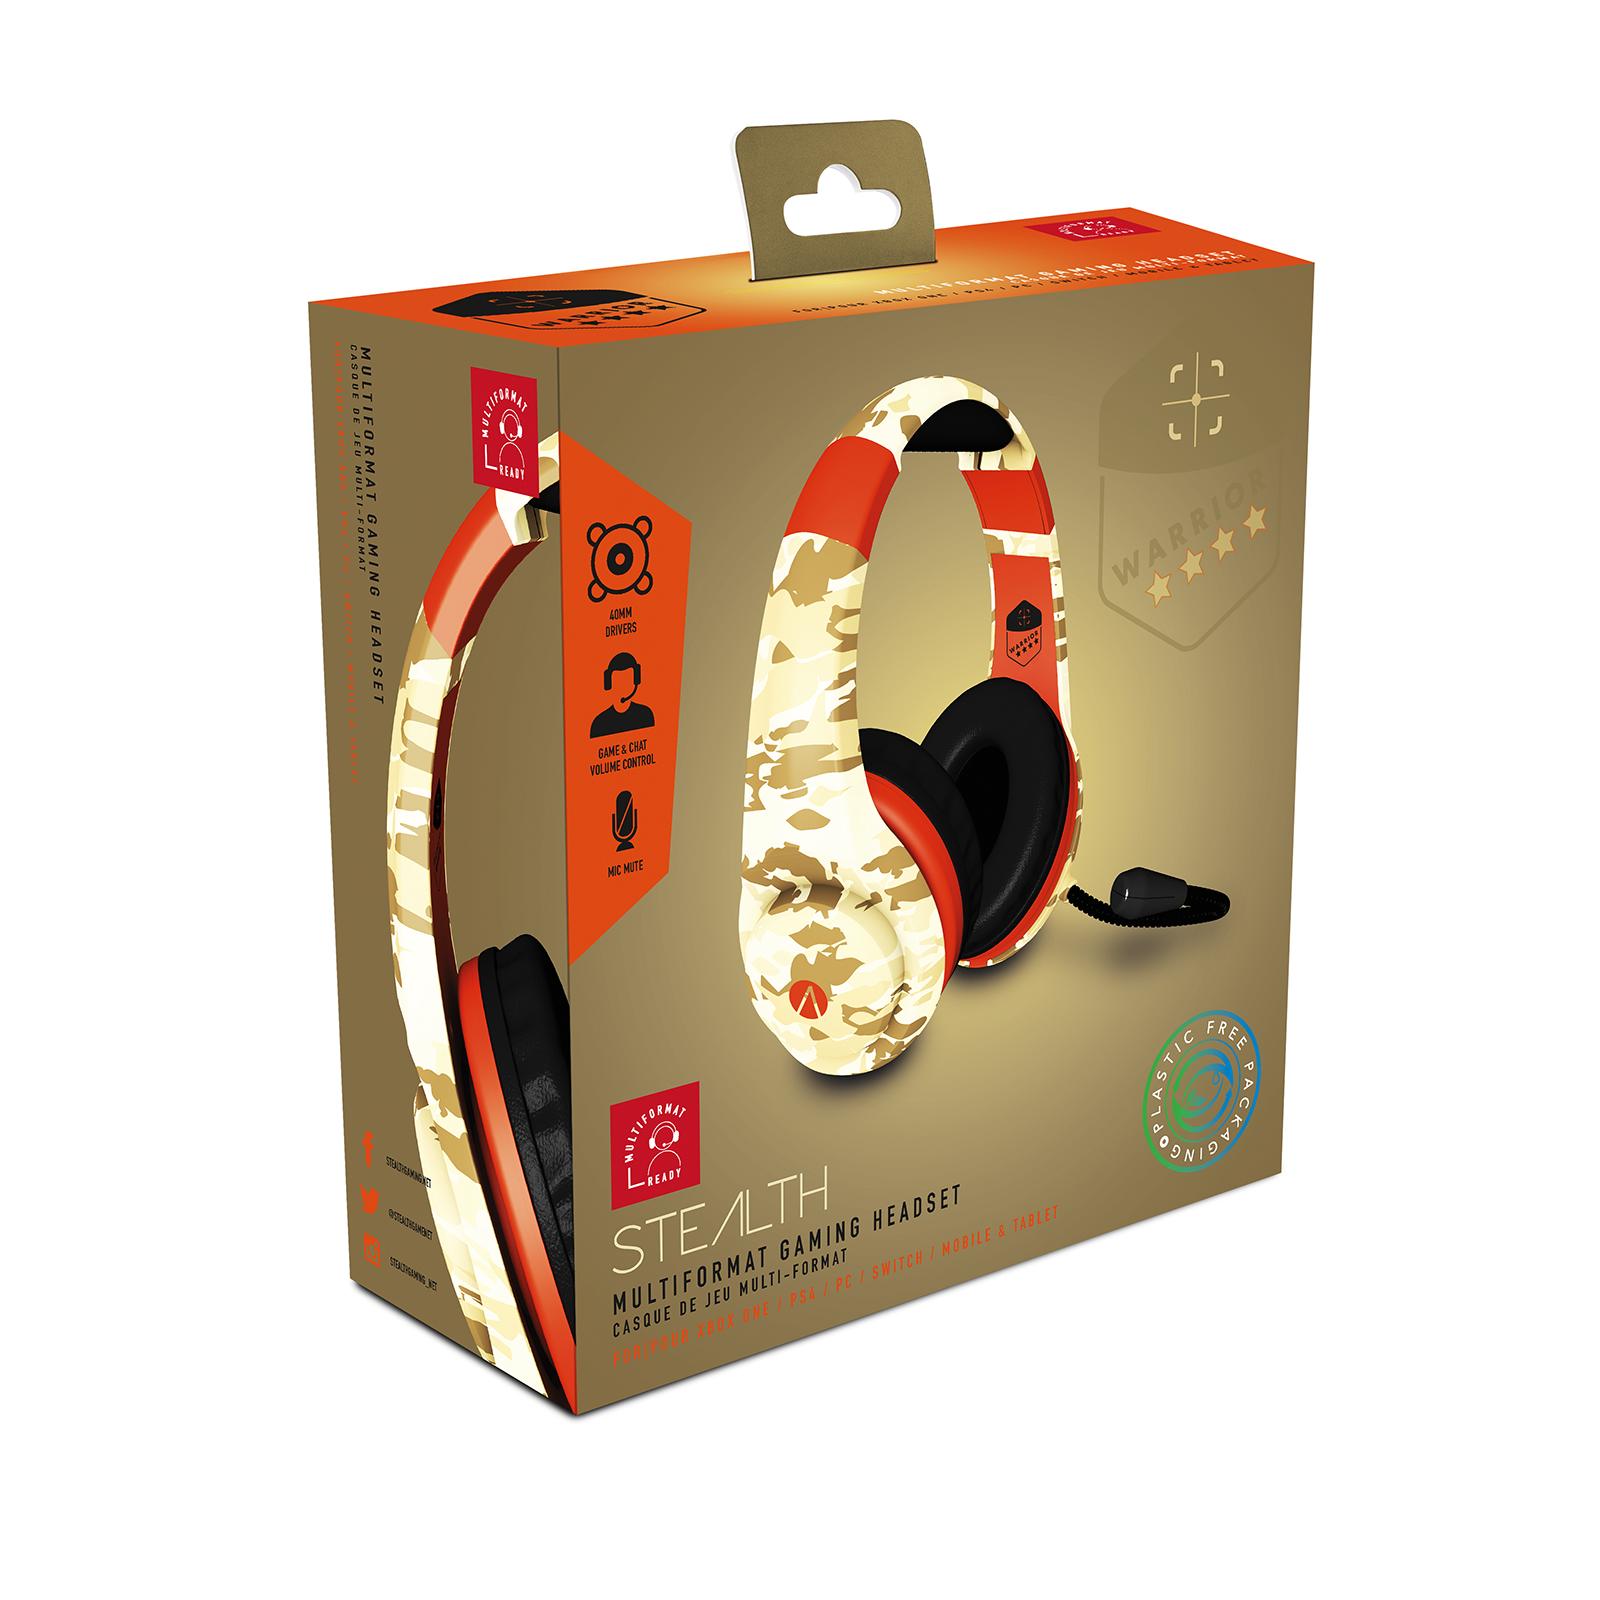 https://www.bigbang.si/upload/catalog/product/678778/slusalke-stealth-warrior-stereo-gaming-headset-mul_5effff667a805.jpg